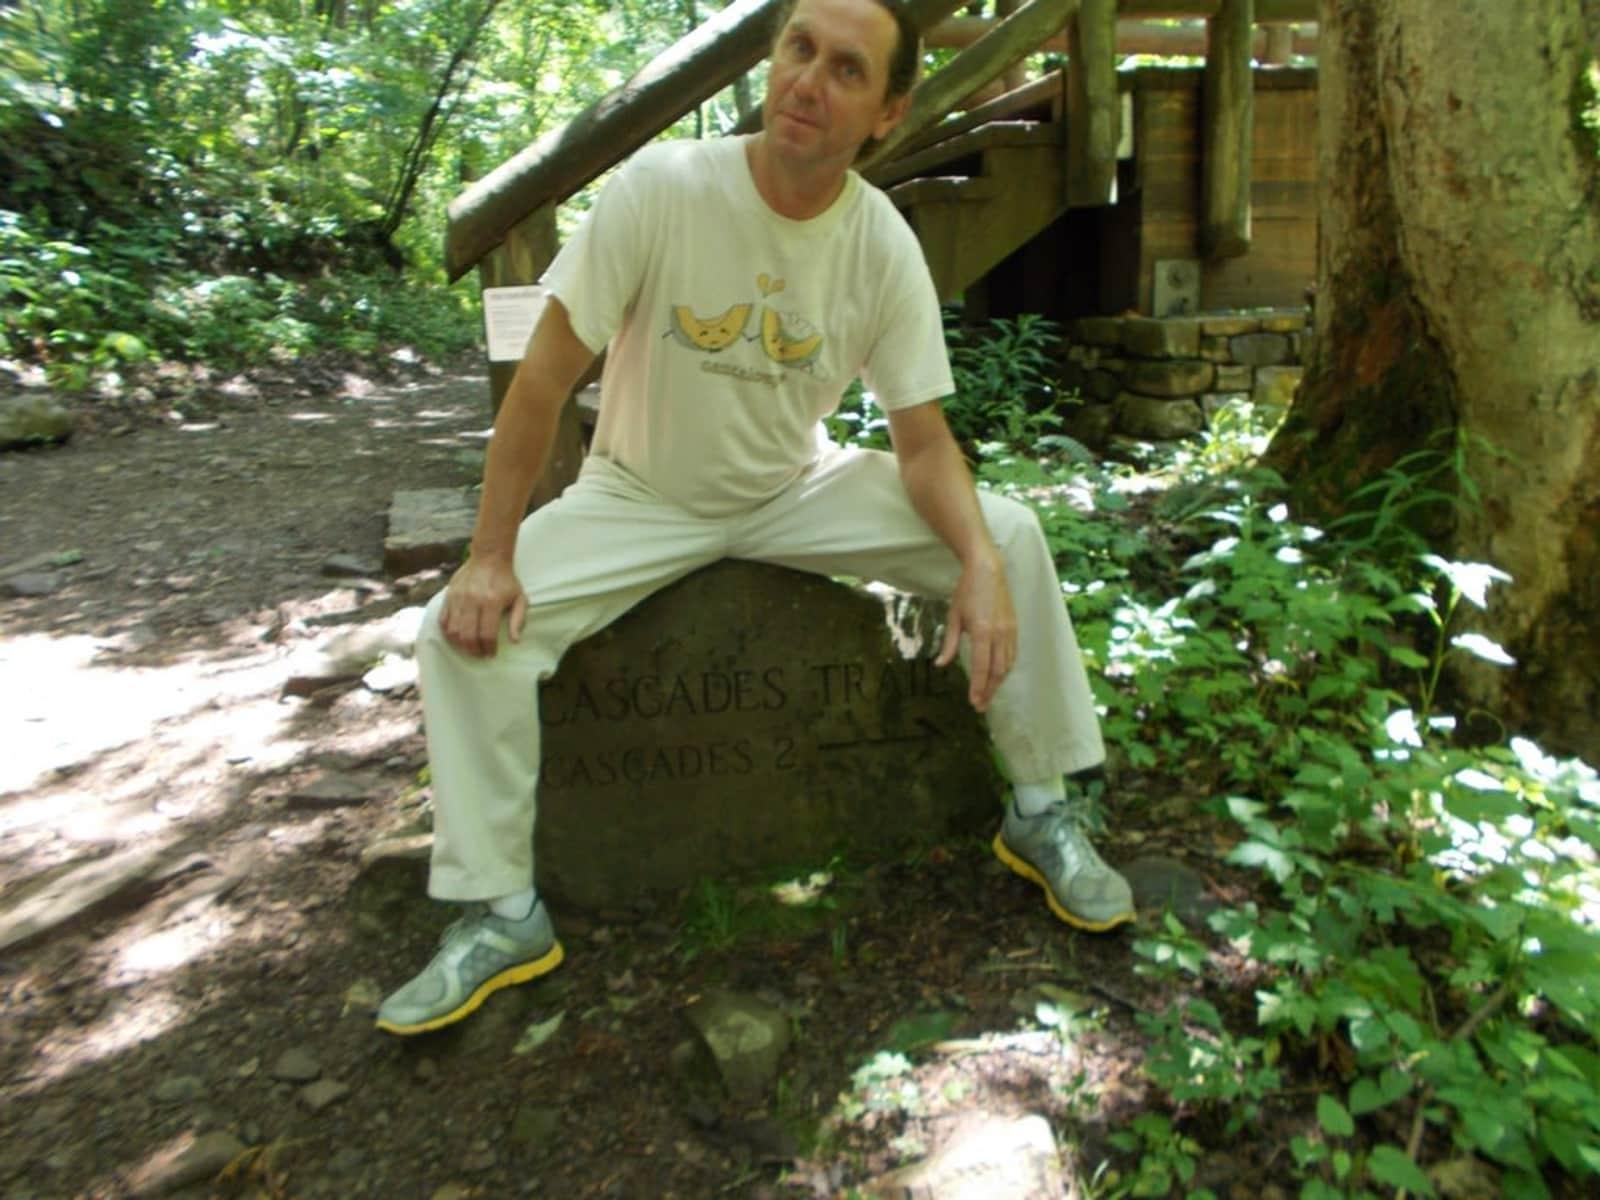 Stephen from Radford, Virginia, United States